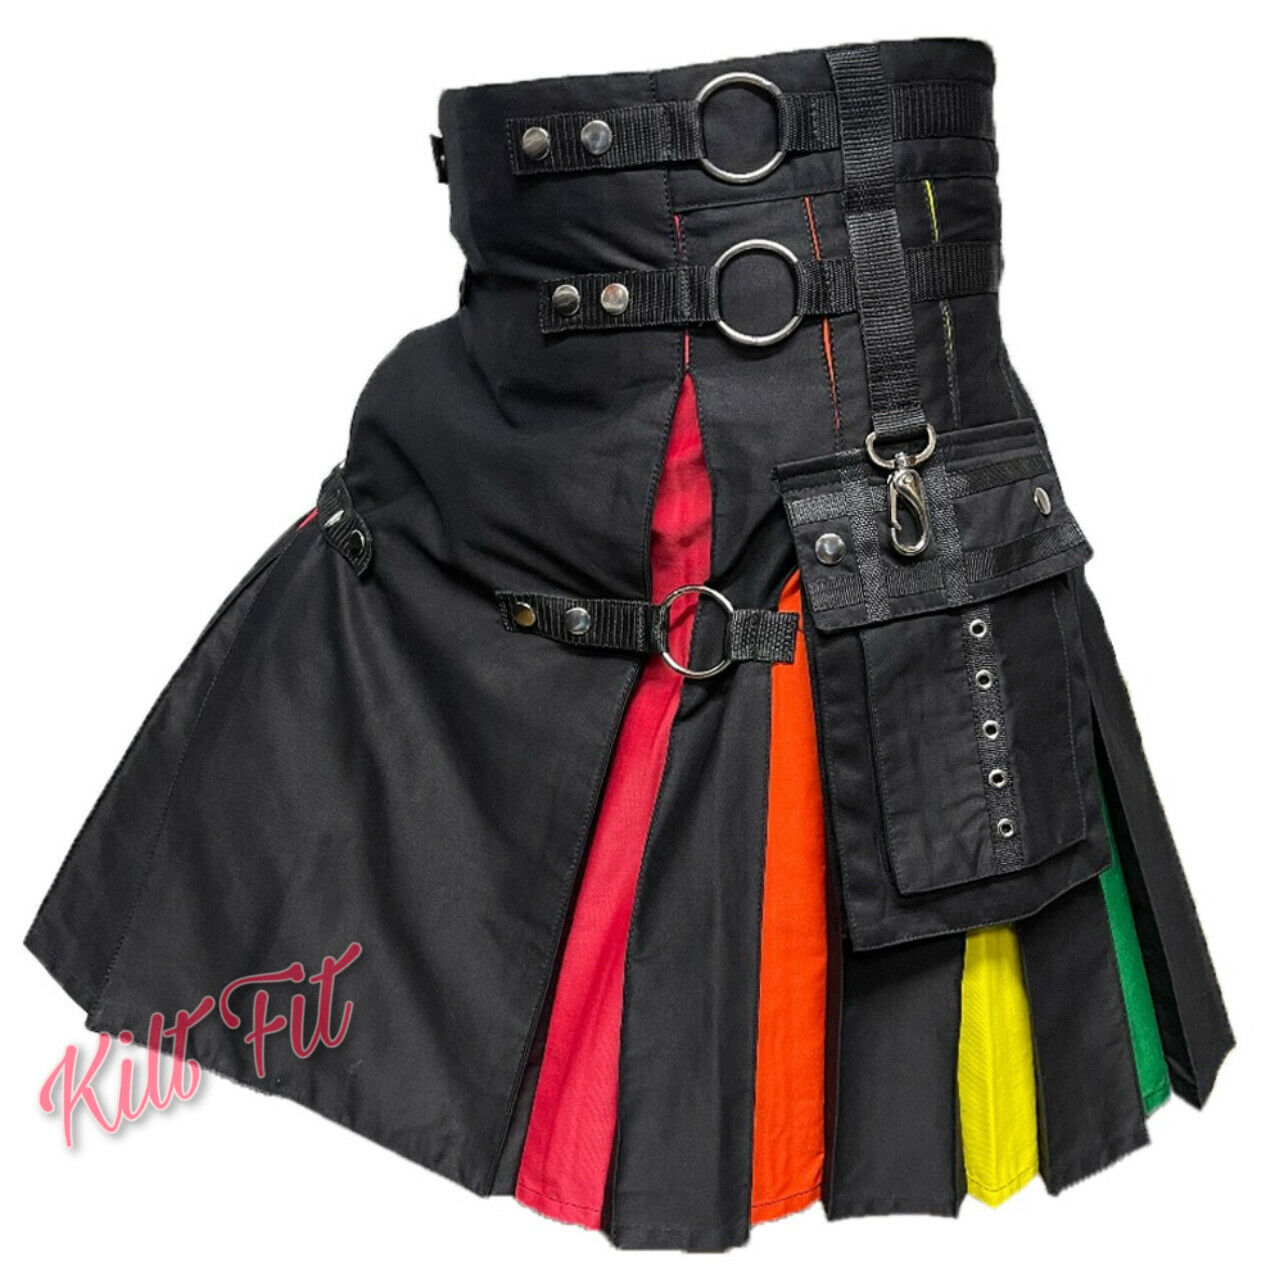 Rainbow Hybrid Utility Kilt Nylon Straps Black Cotton Pride Kilt 28